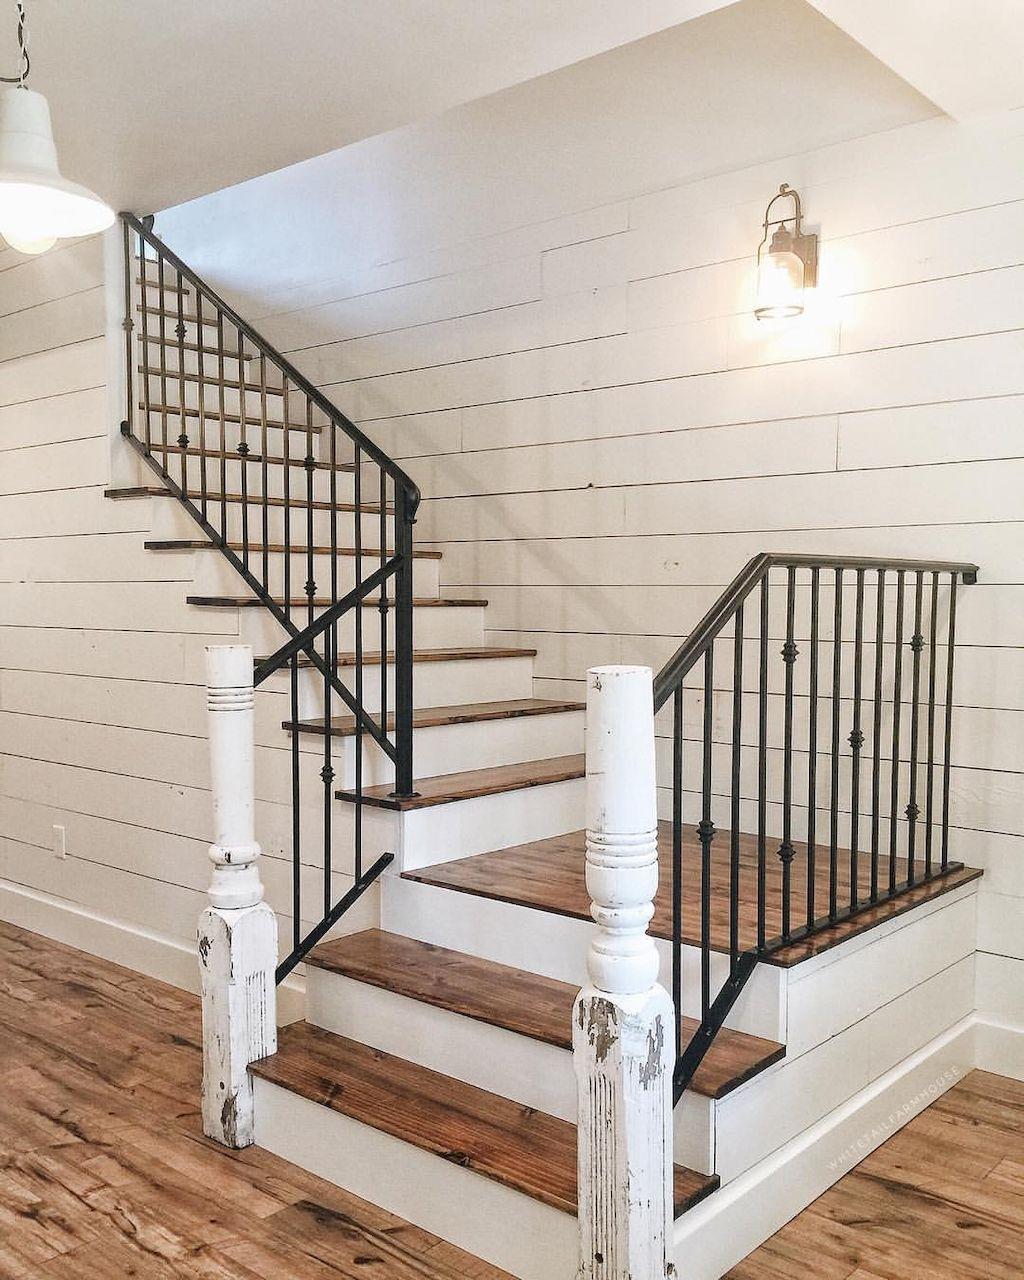 Modern Farmhouse Staircase Ideas : modern, farmhouse, staircase, ideas, Gorgeous, Modern, Farmhouse, Staircase, Decor, Ideas, Https://livingmarch.com/80-modern-farmhouse-stairca…, Remodel,, House, Living, Room,